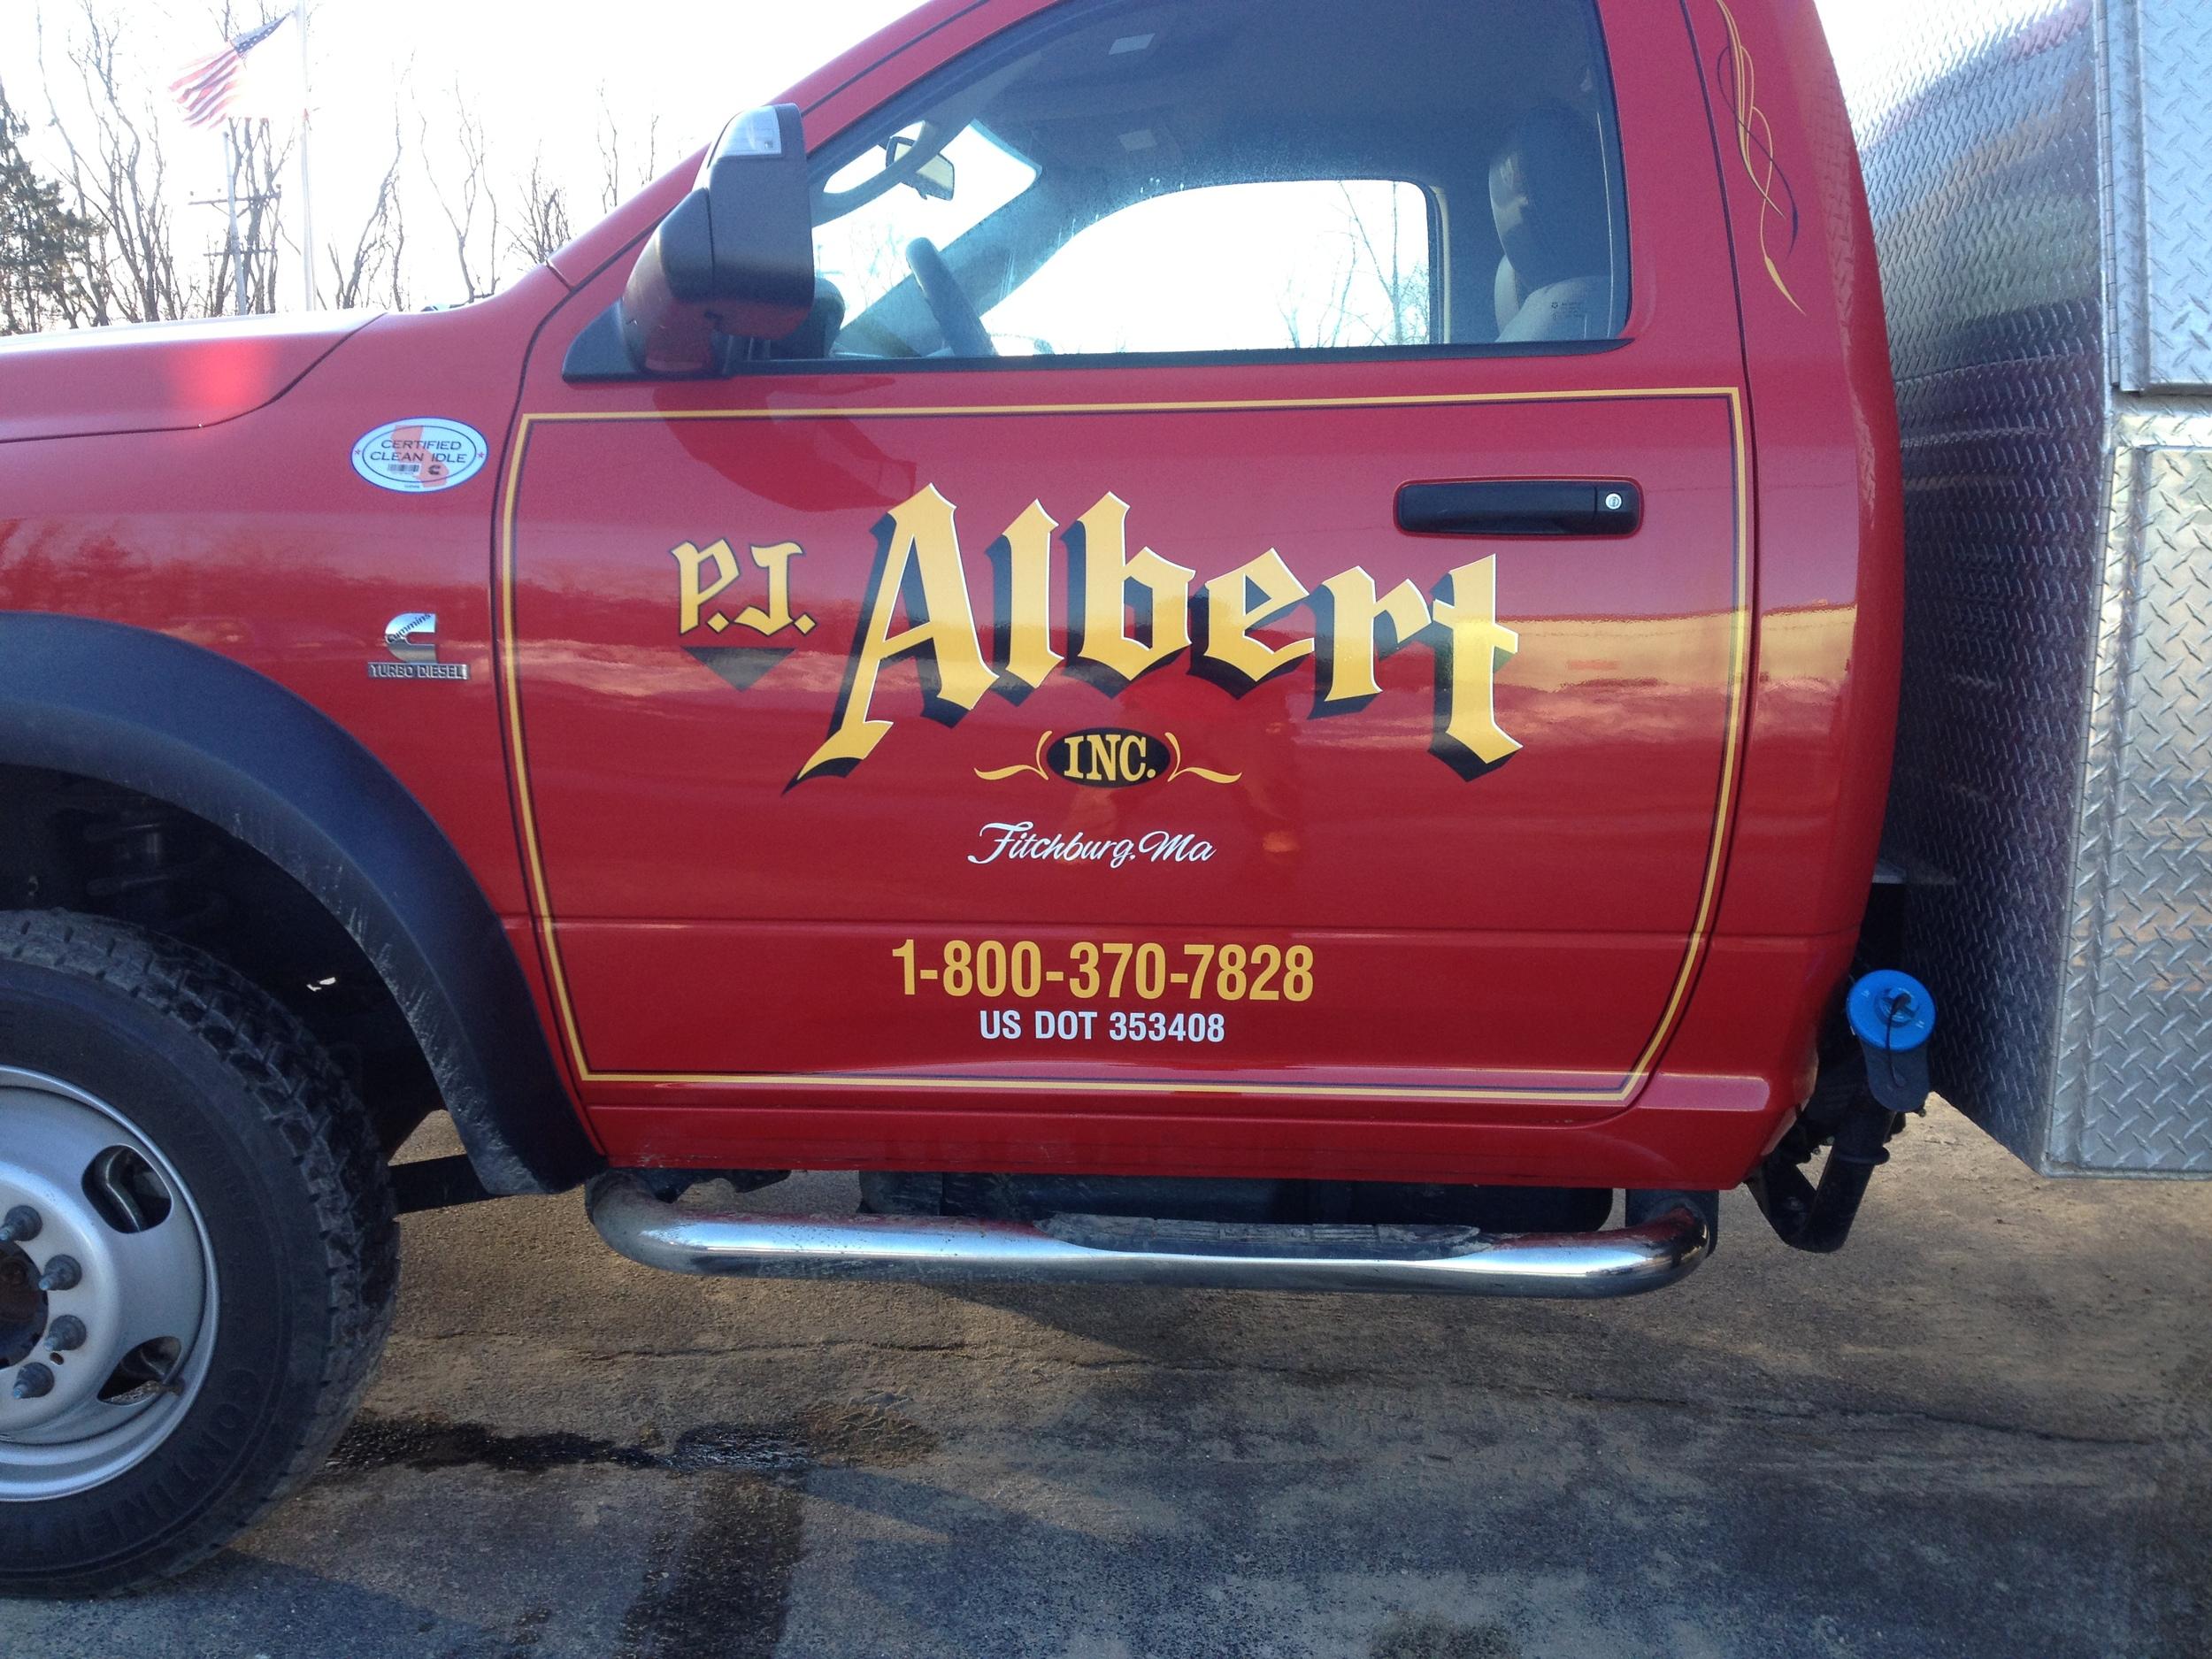 PJ Albert Truck.JPG